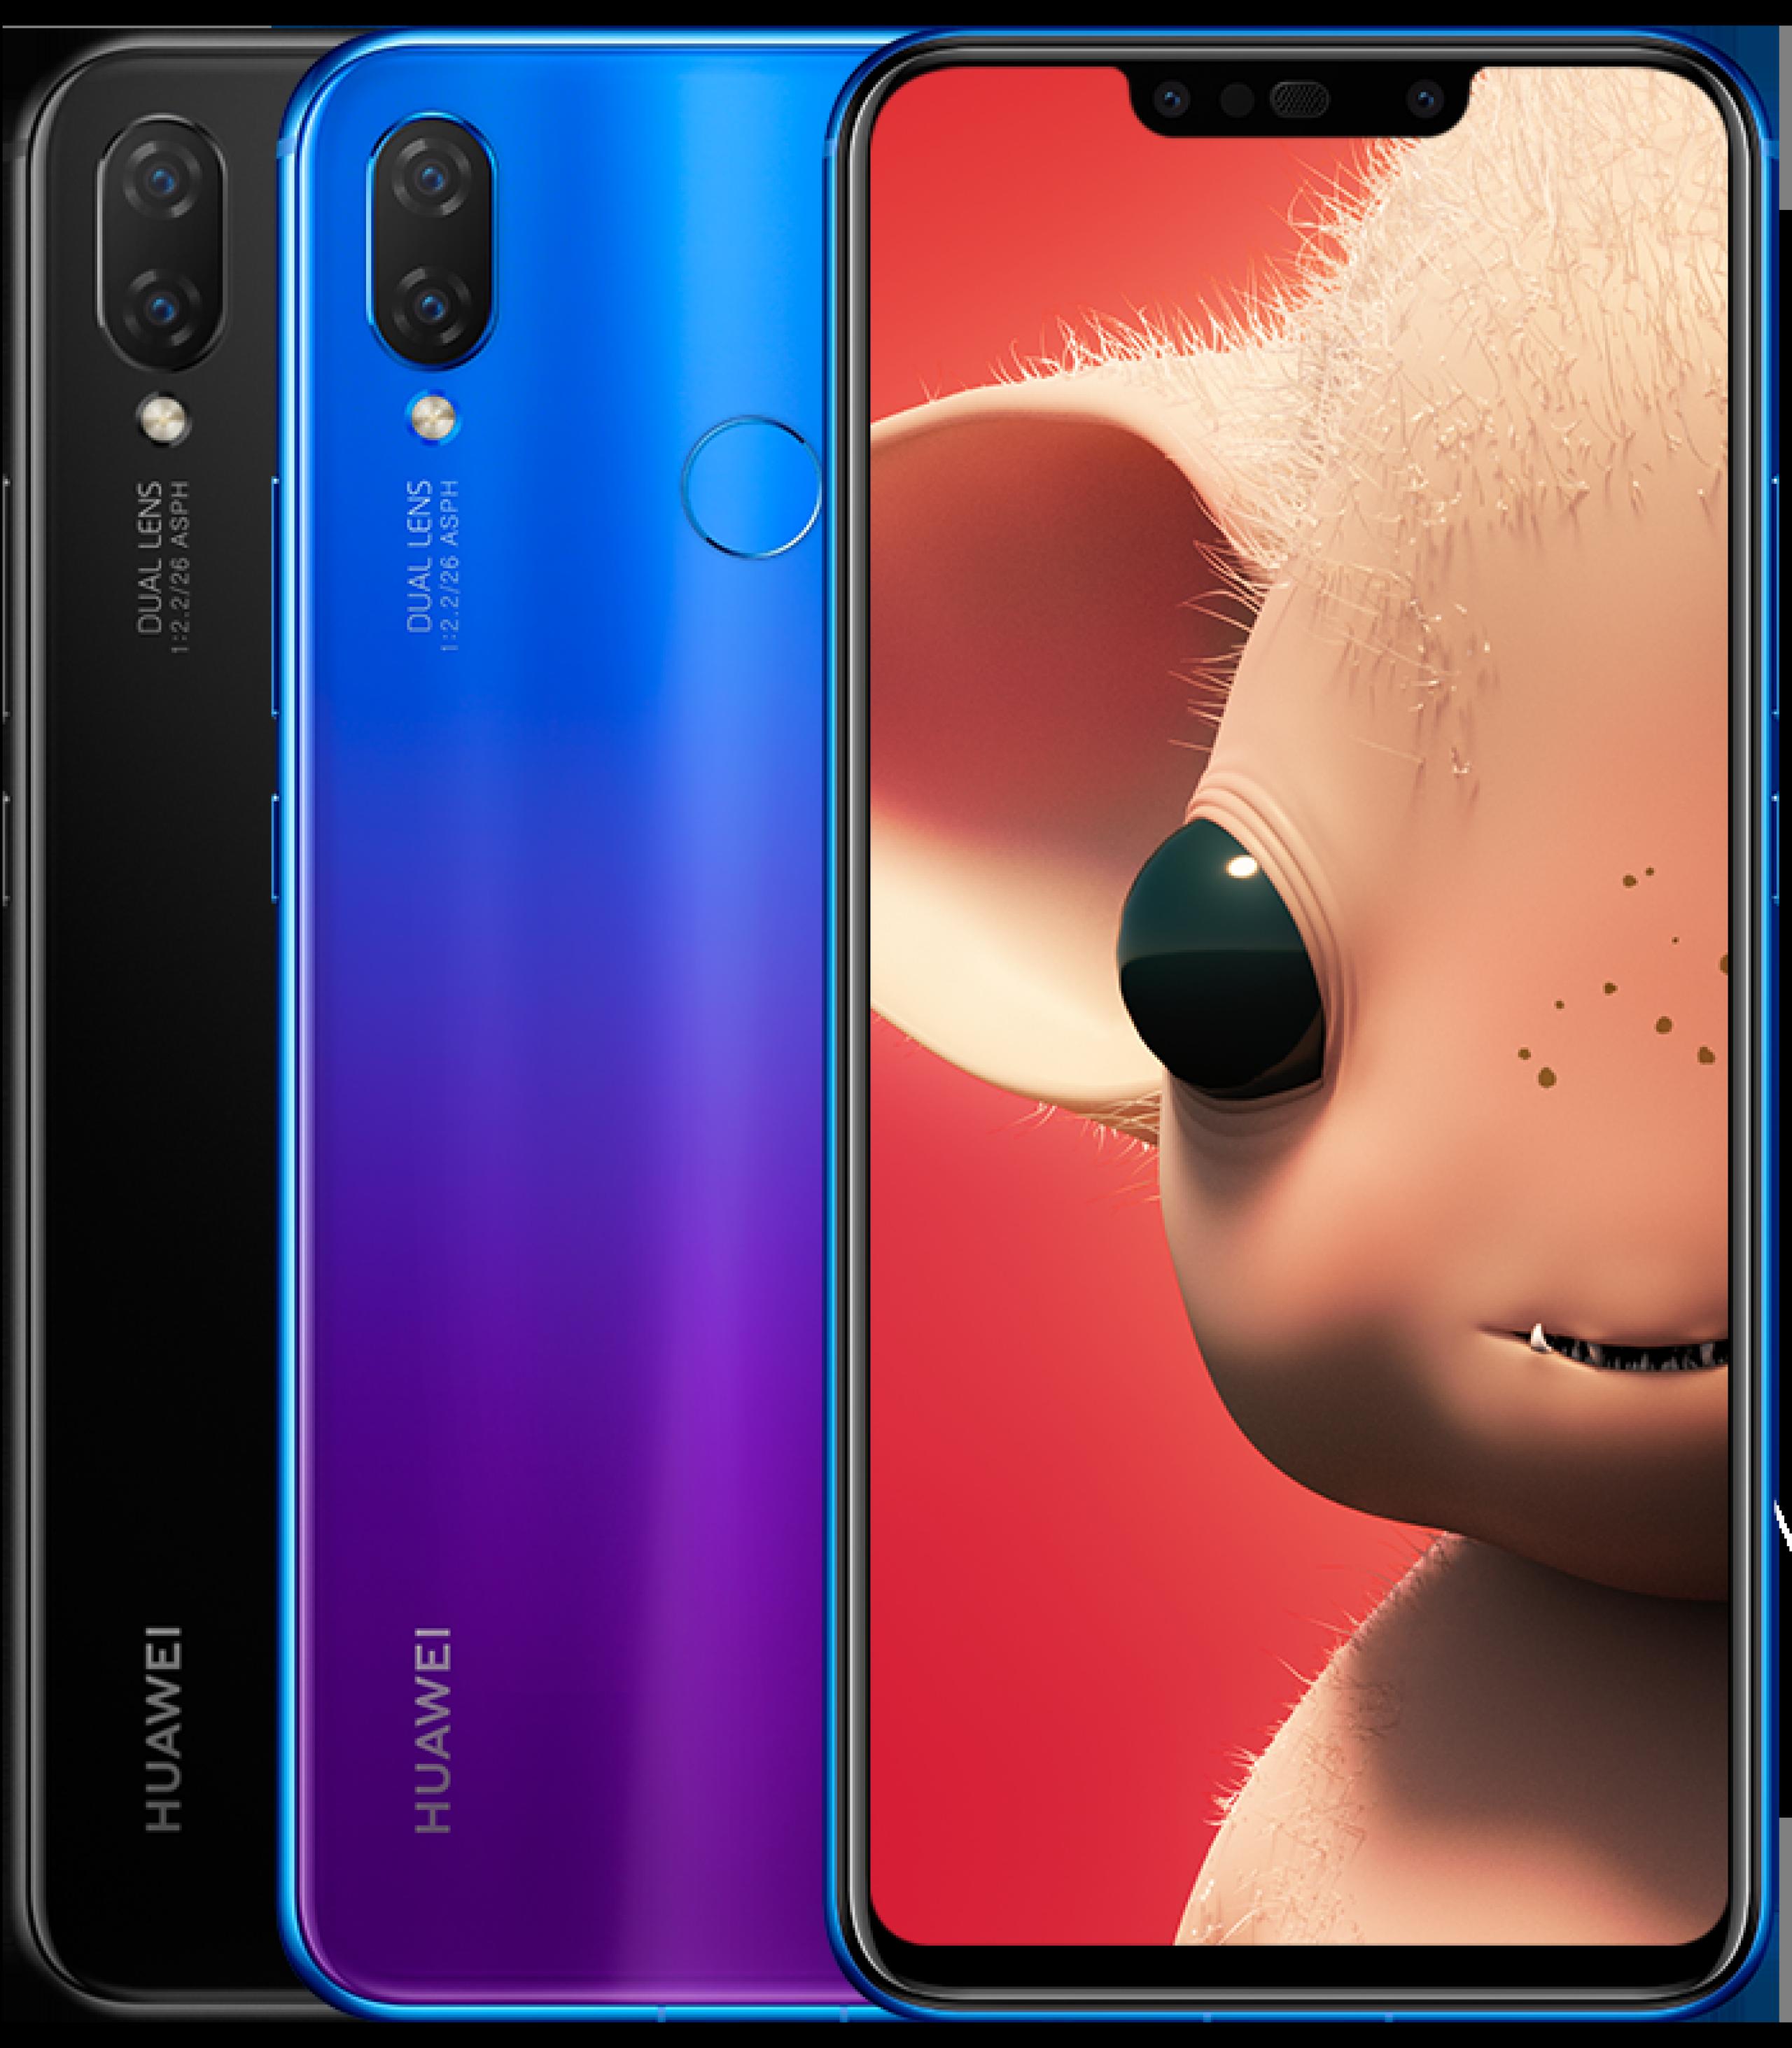 Huawei P Smart 2019 Sim Karte Einlegen.Test Huawei P Smart Plus 2018 Smartphone Notebookcheck